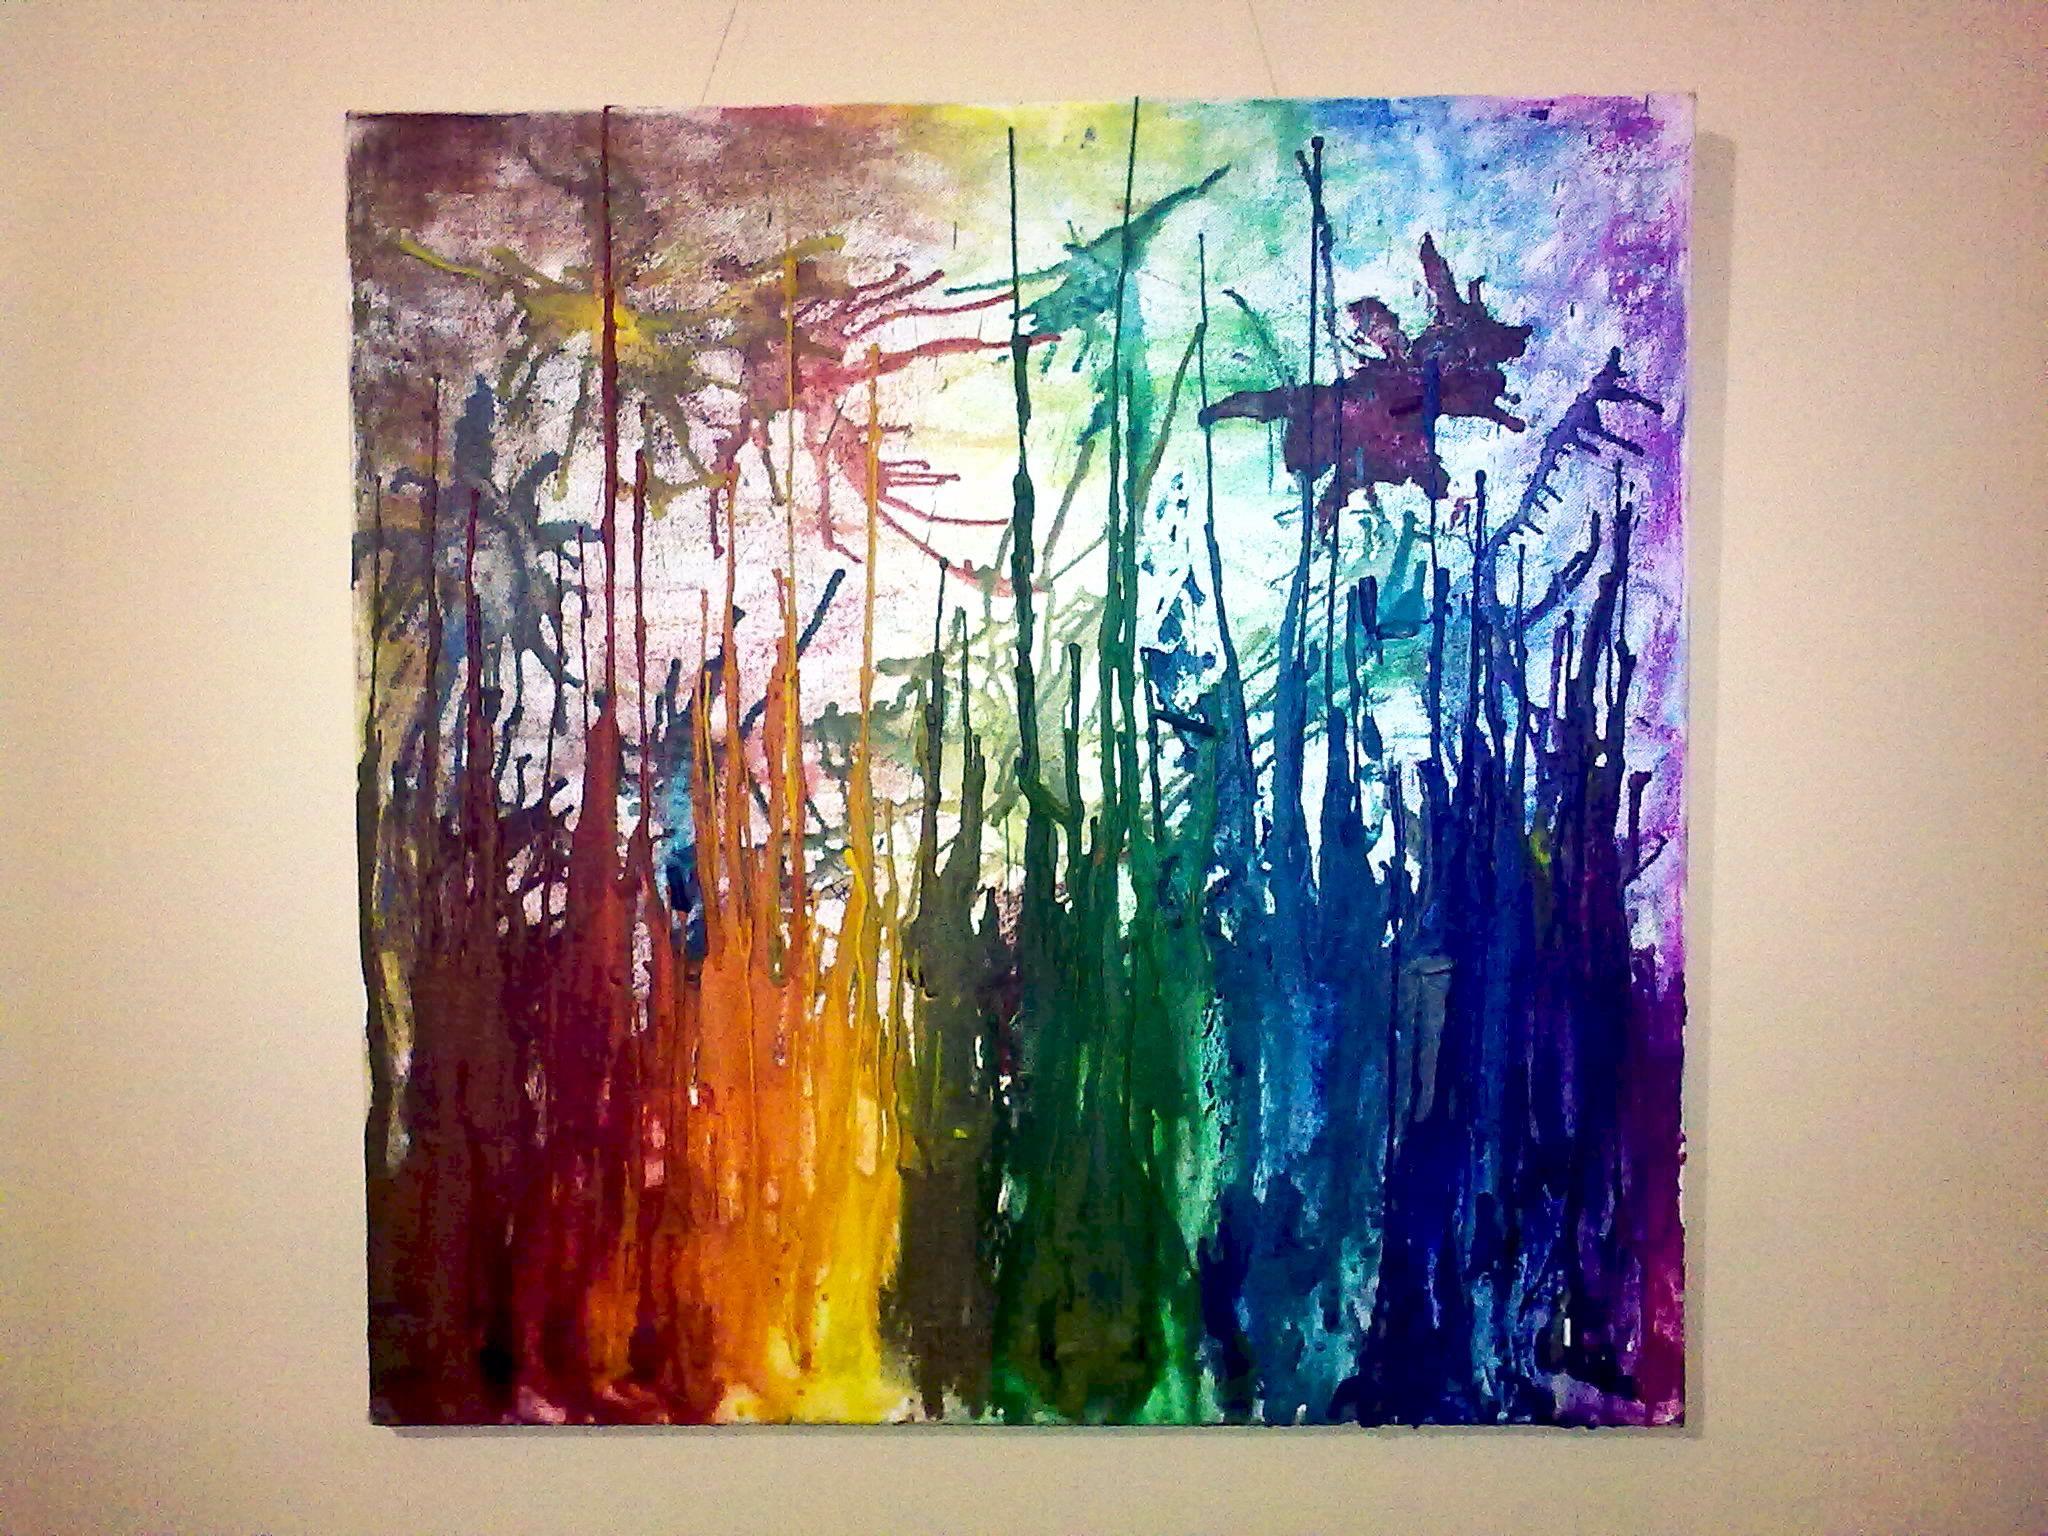 Melting crayon on canvas diy pinterest for Crayon diy canvas